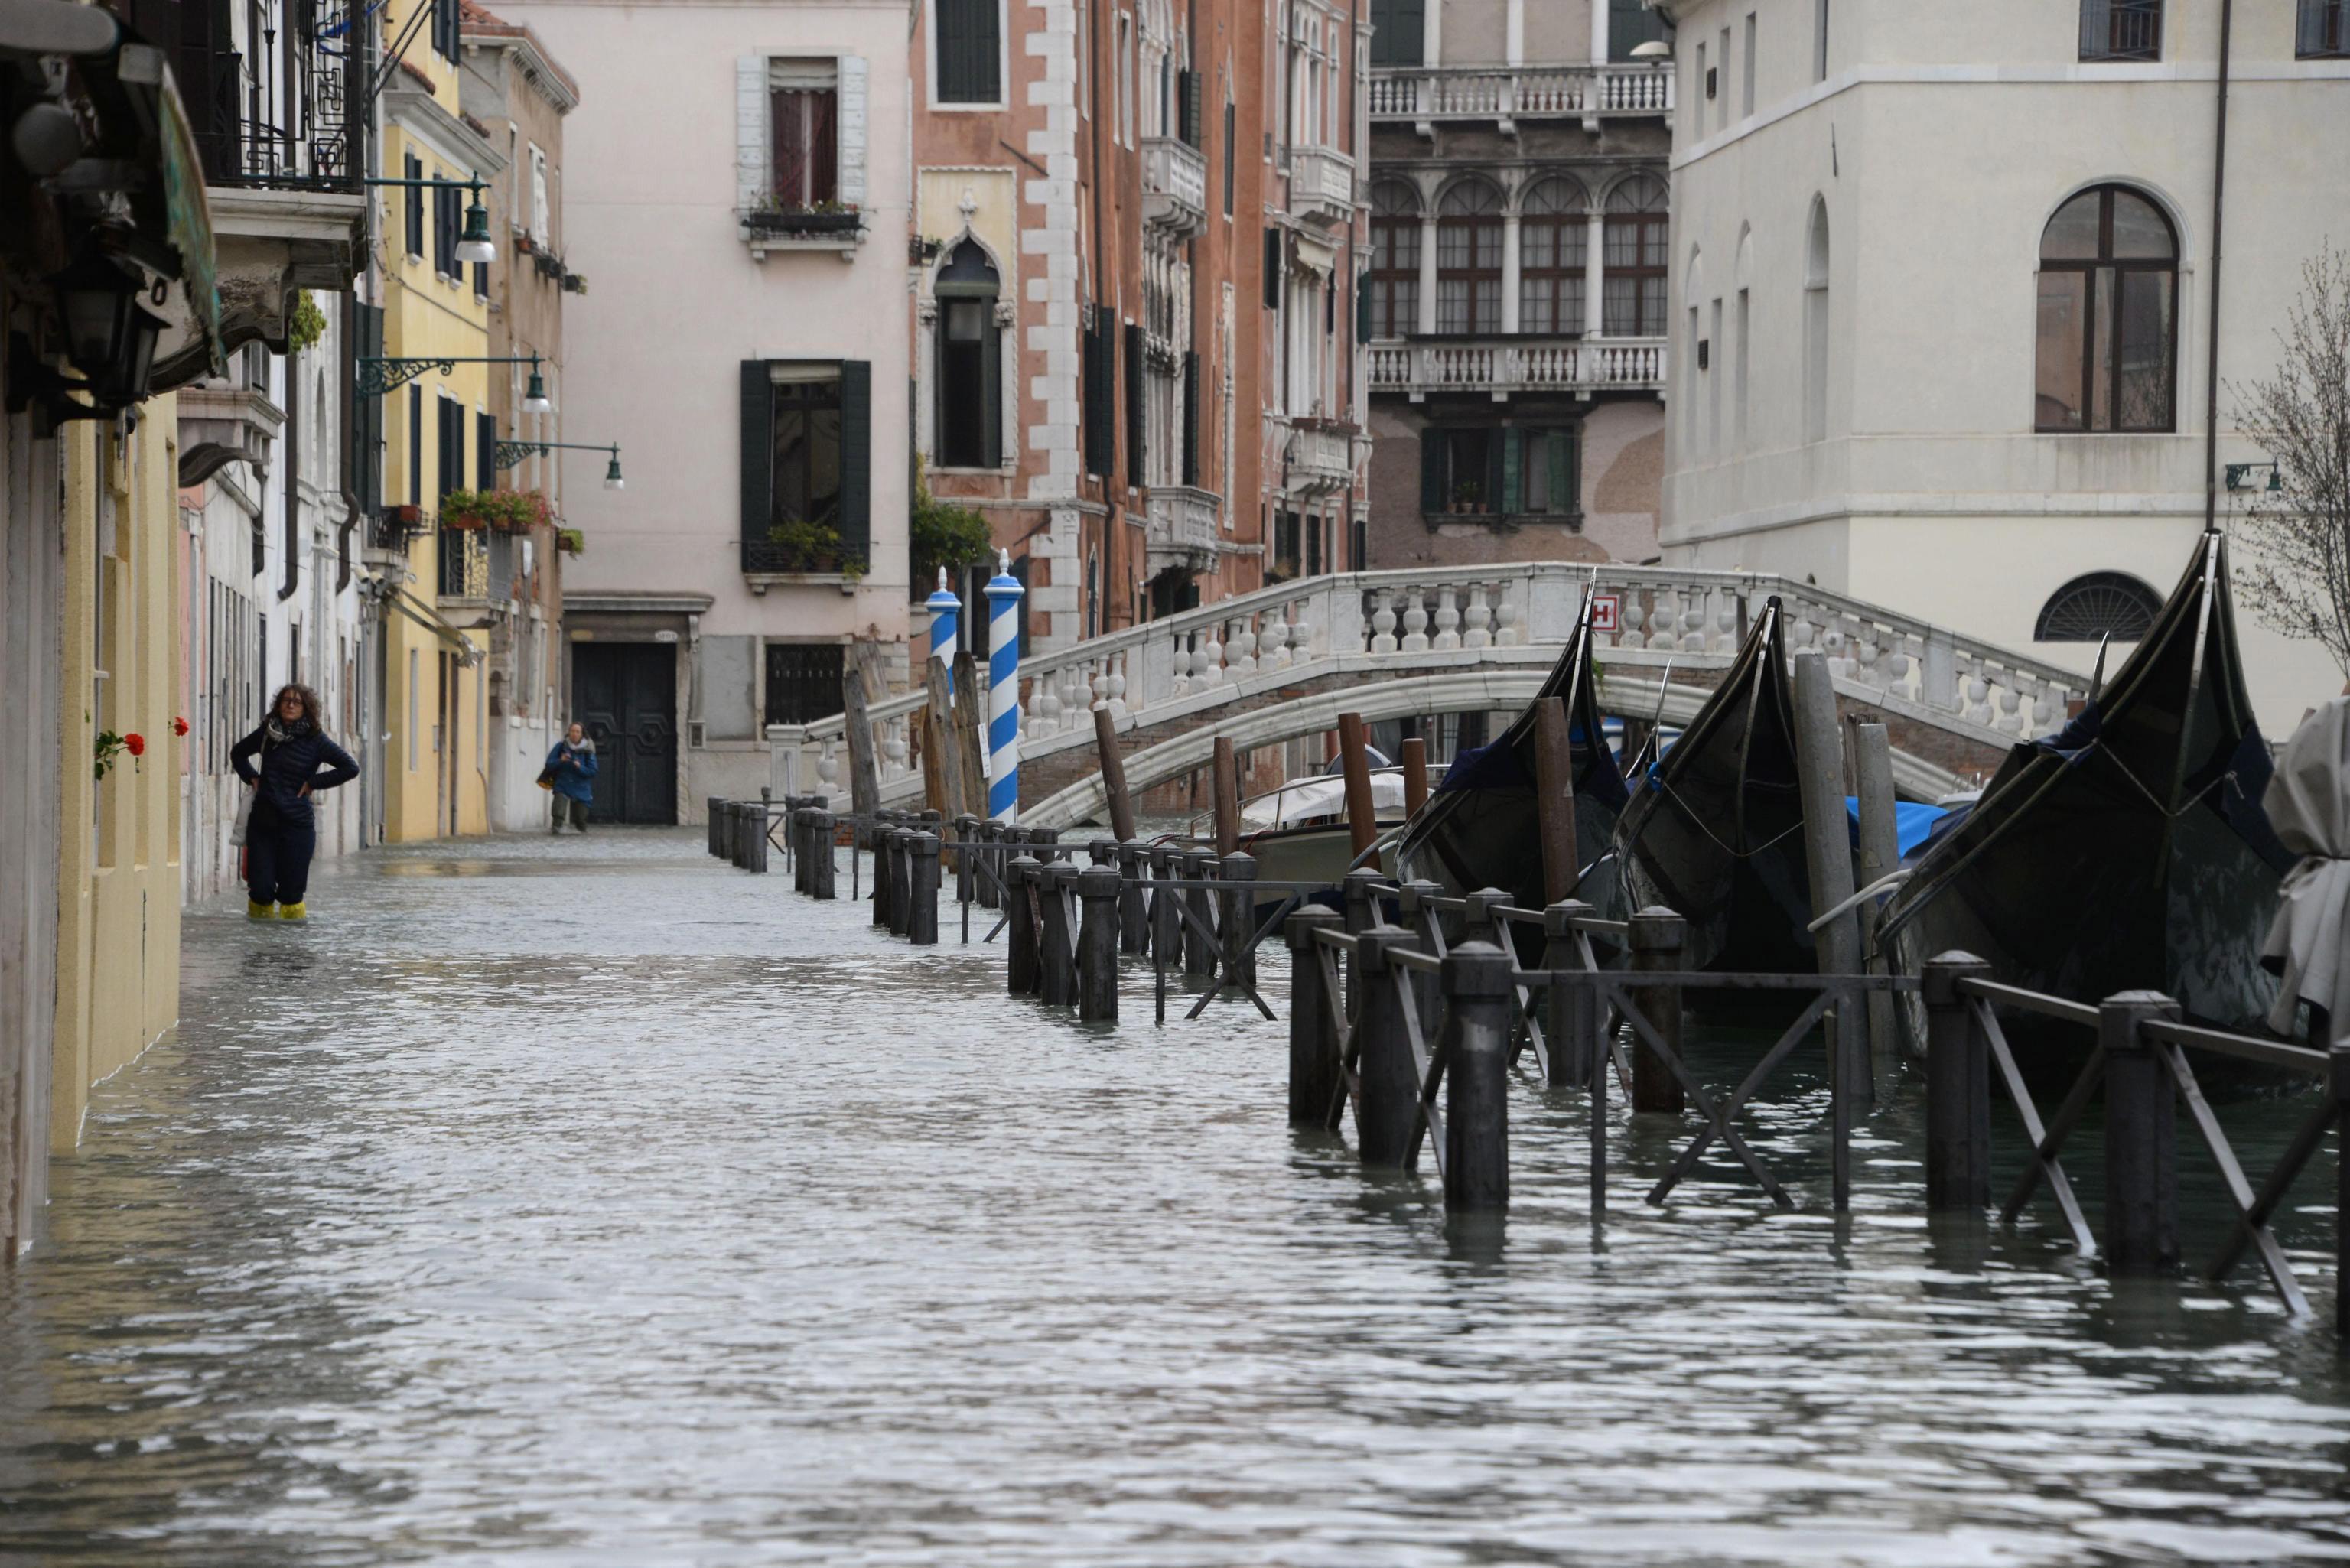 ITALIJA Petero mrtvih u oluji, Venecija pod vodom